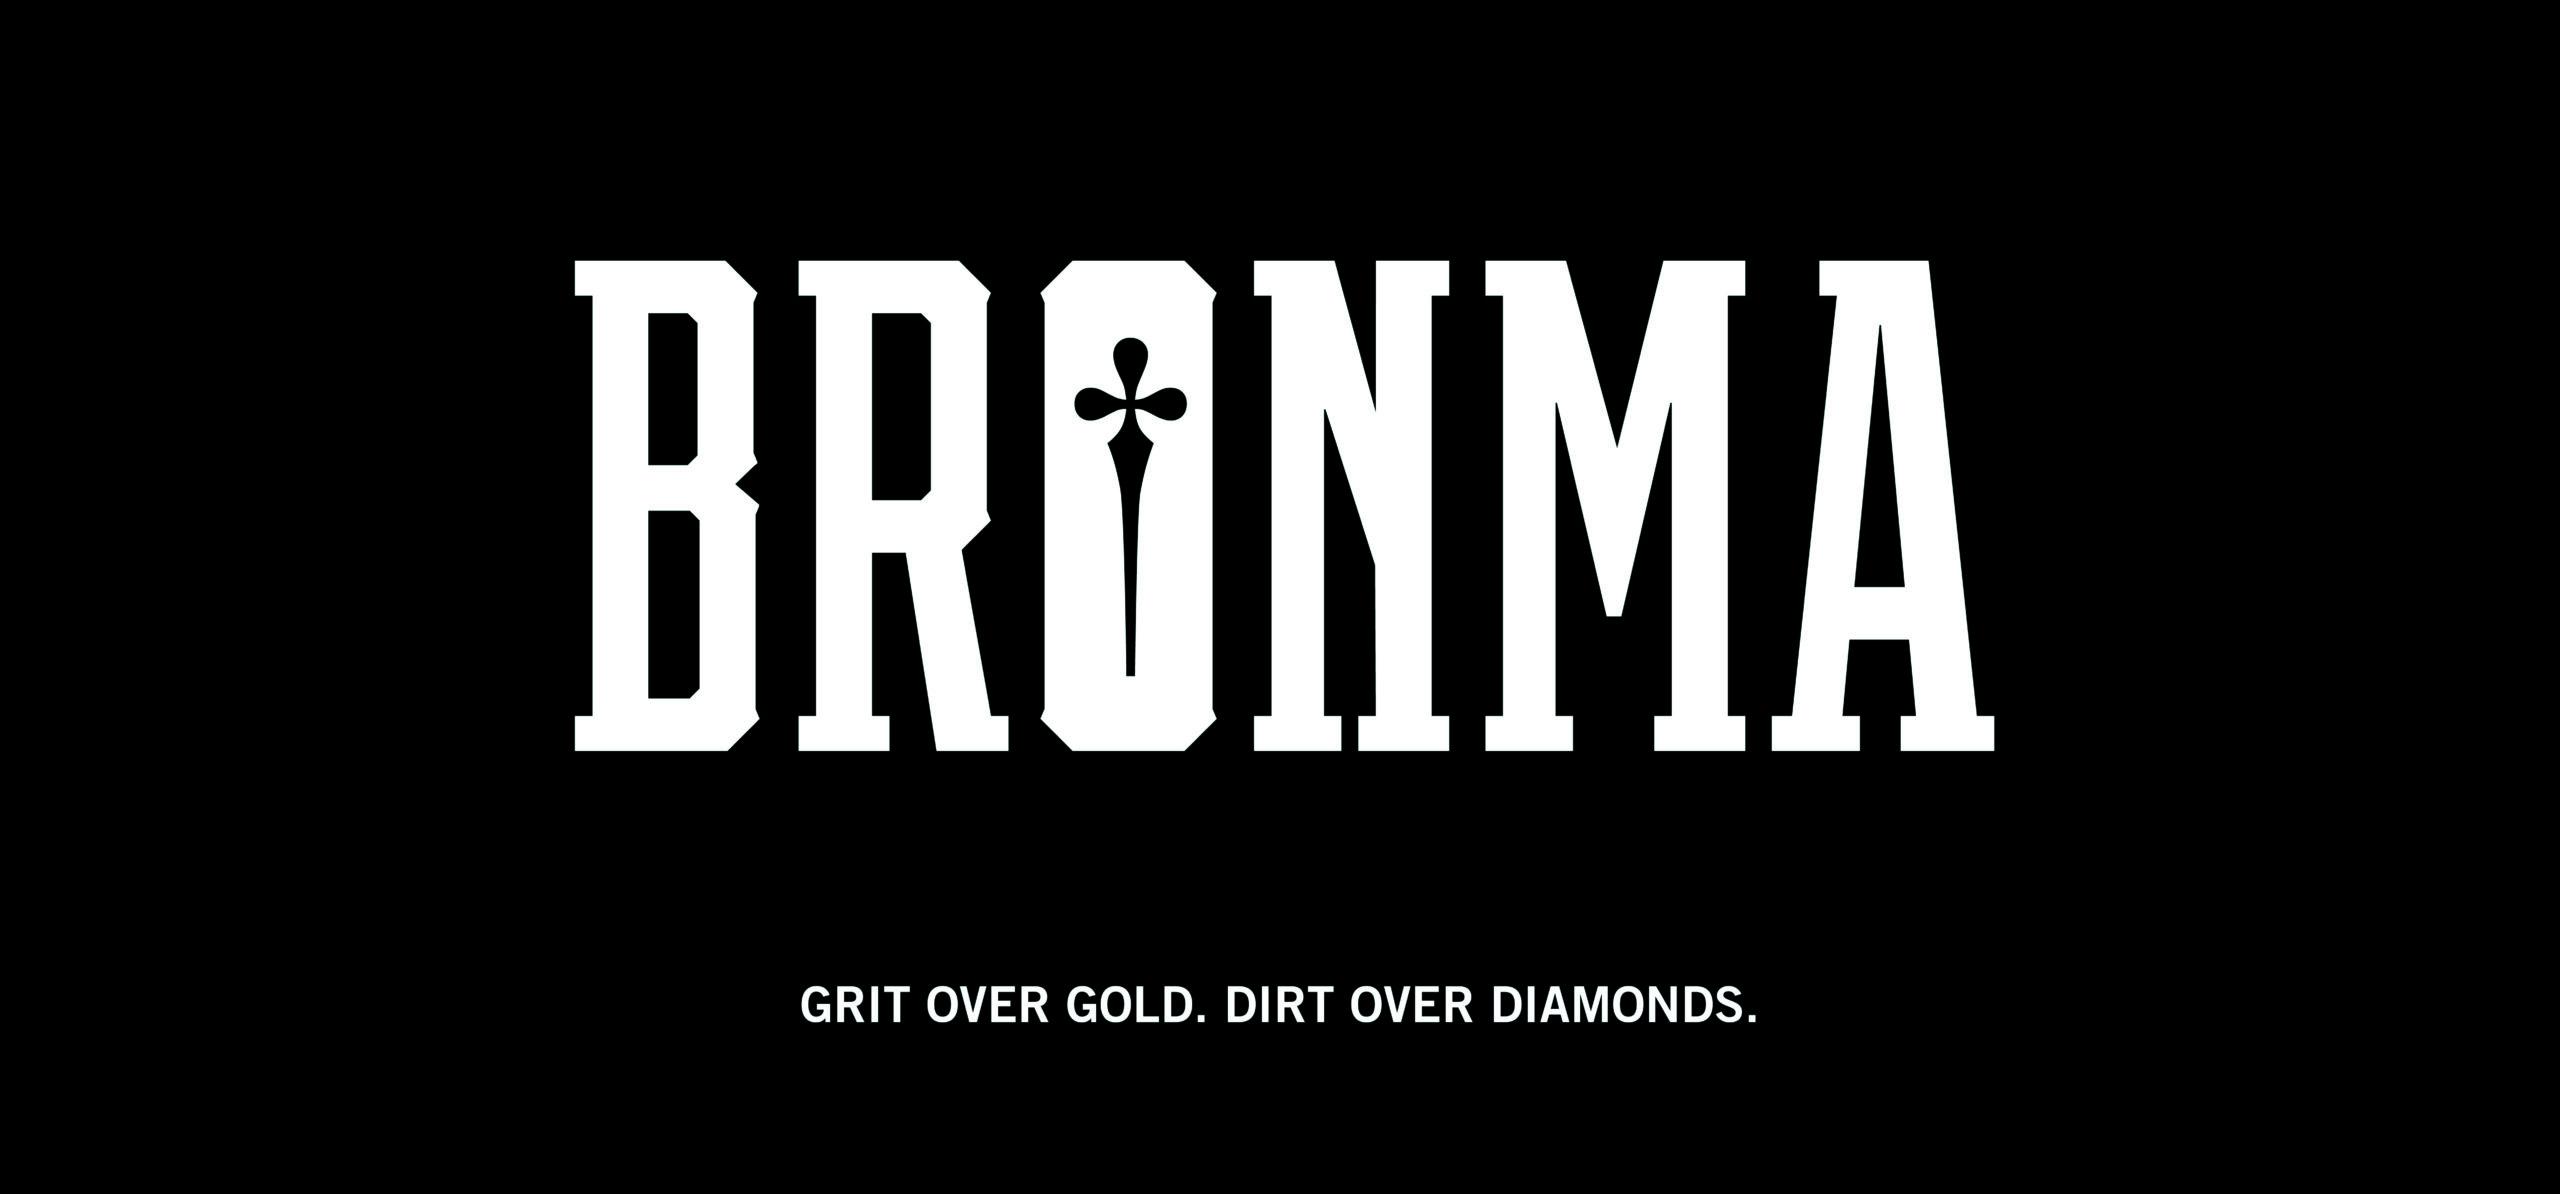 BRONMA_Title-01